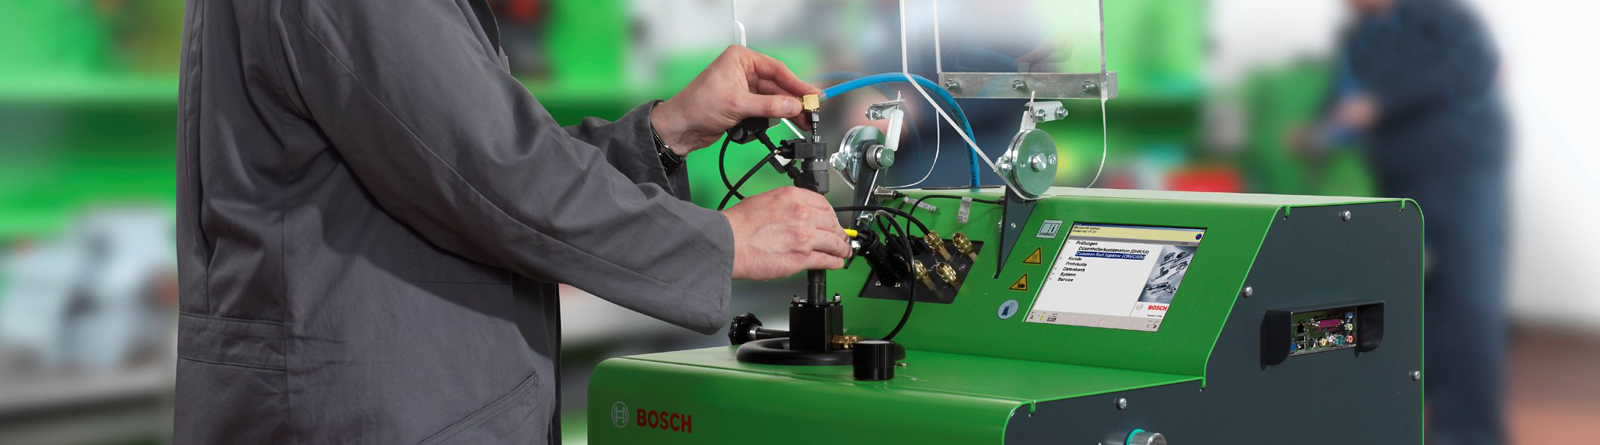 Betere Injectoren testen - Büchli IU-77